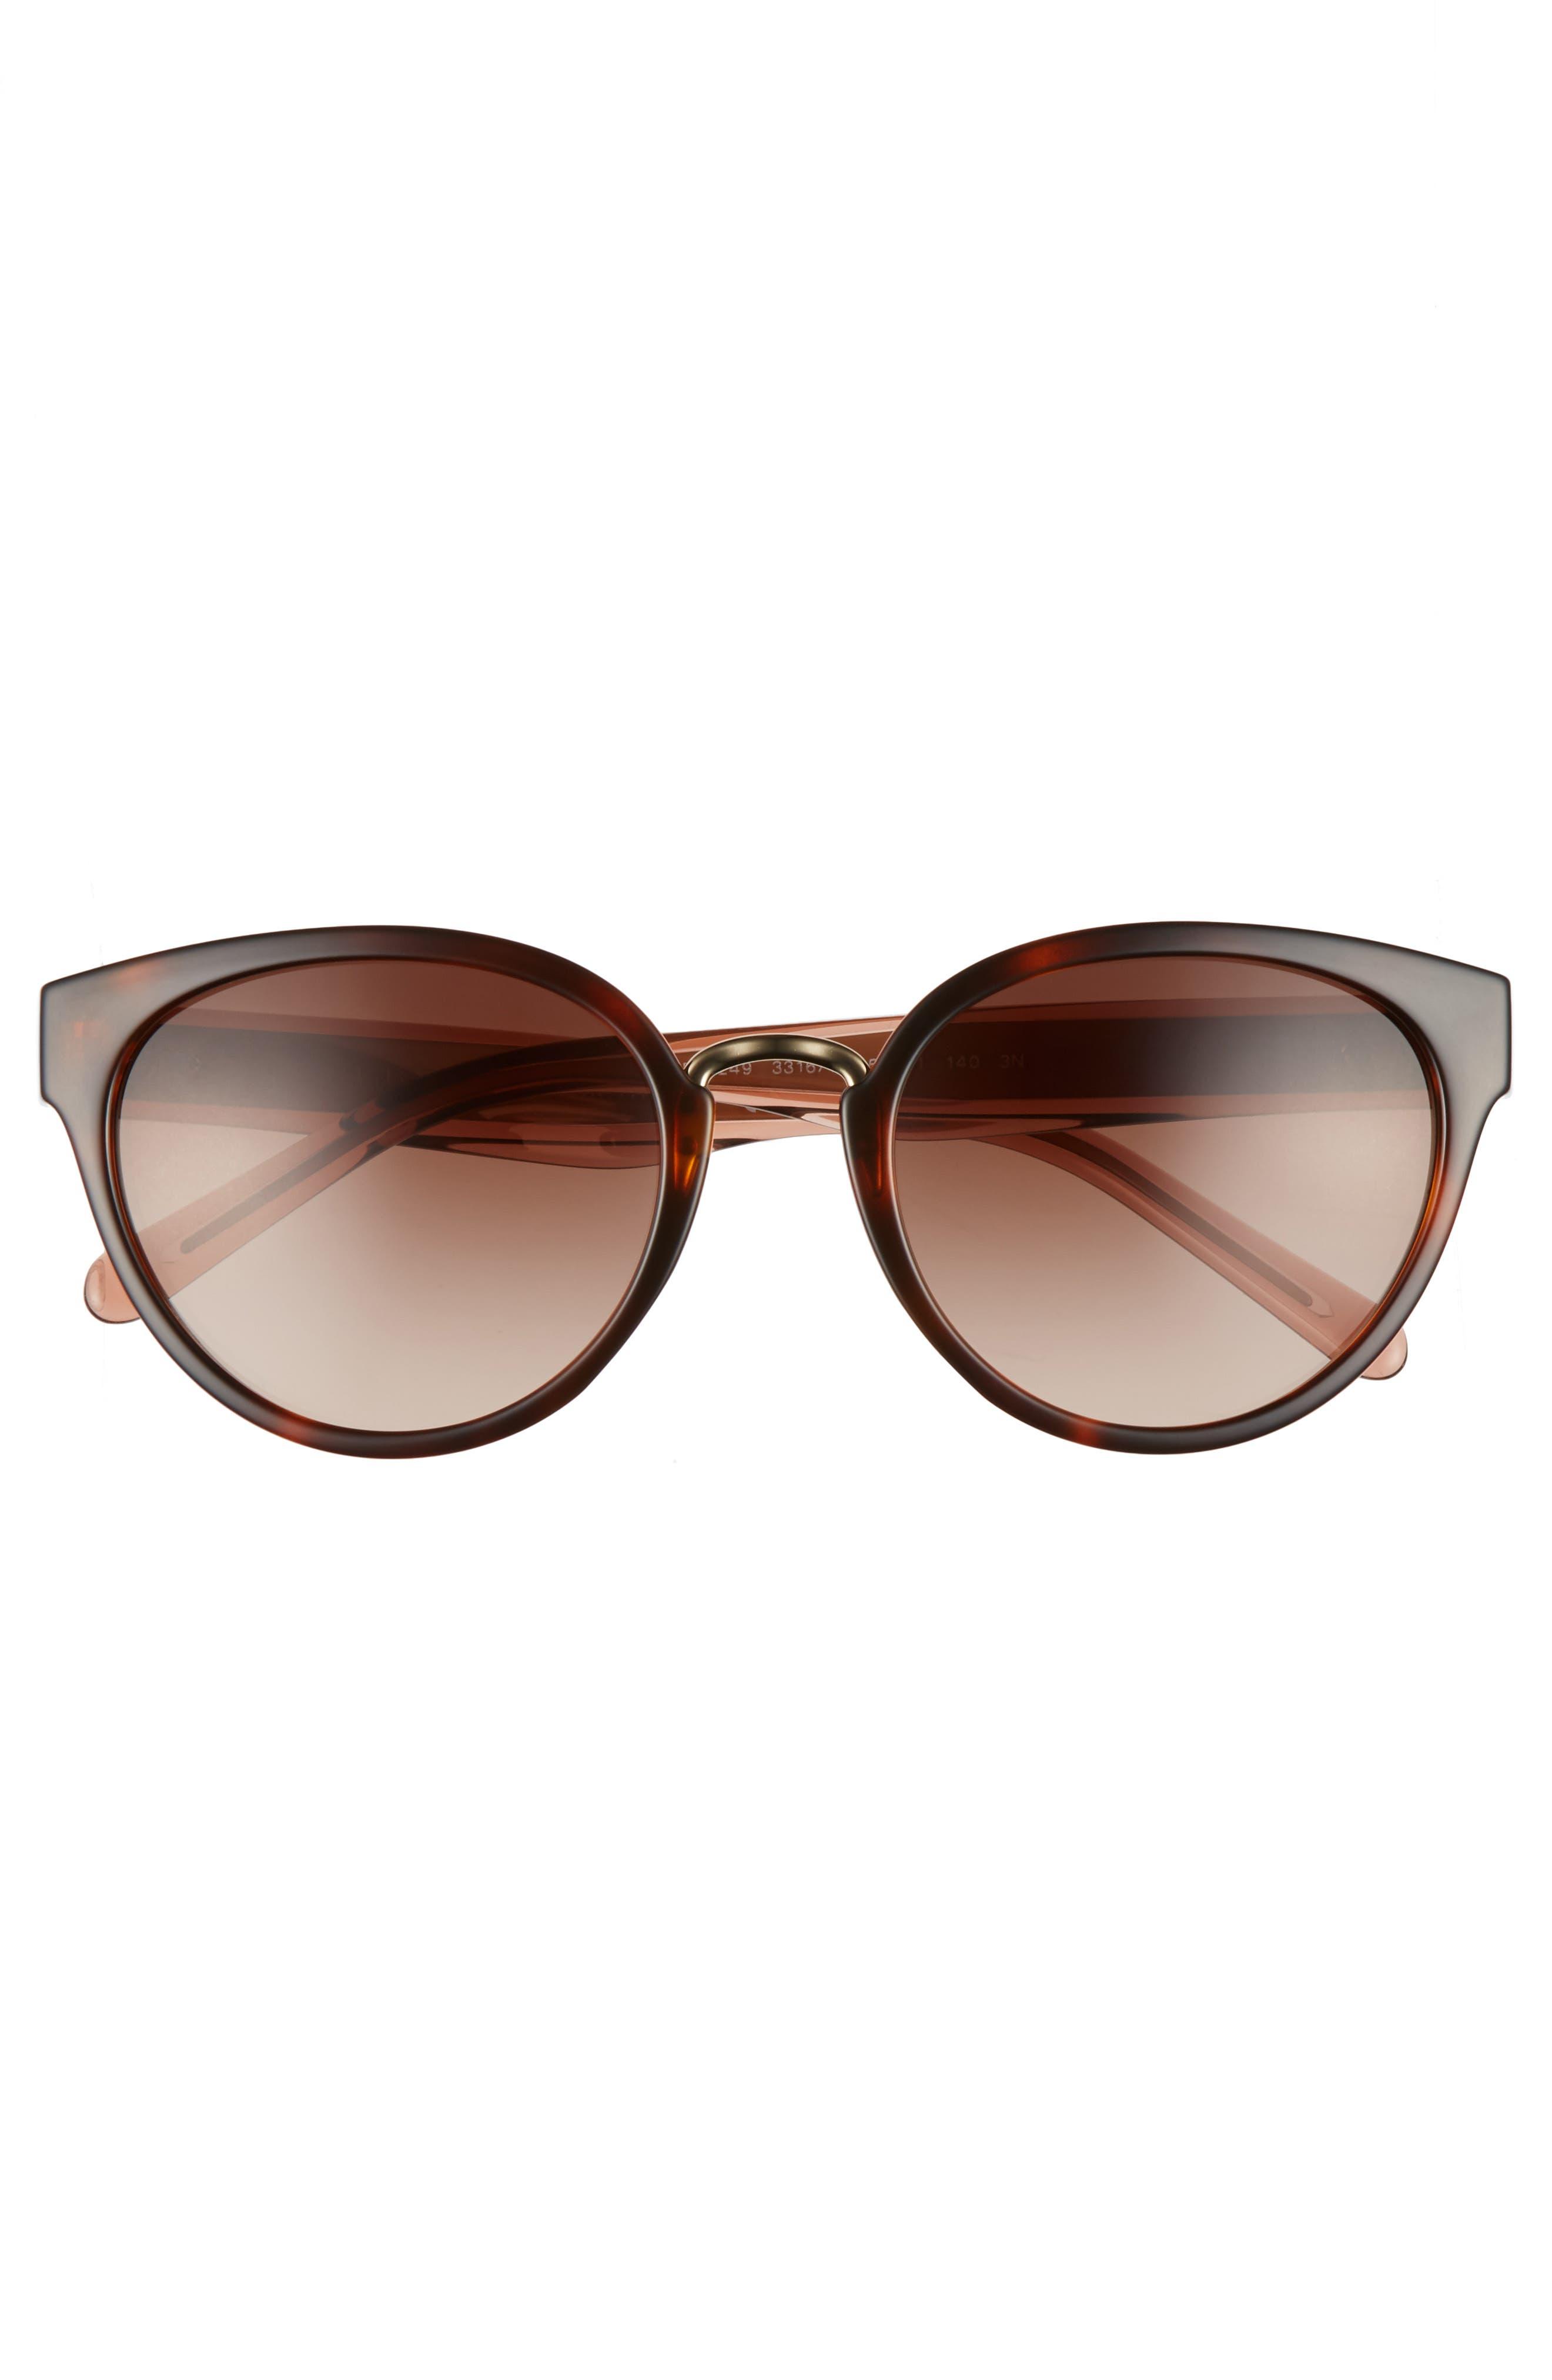 53mm Gradient Cat Eye Sunglasses,                             Alternate thumbnail 10, color,